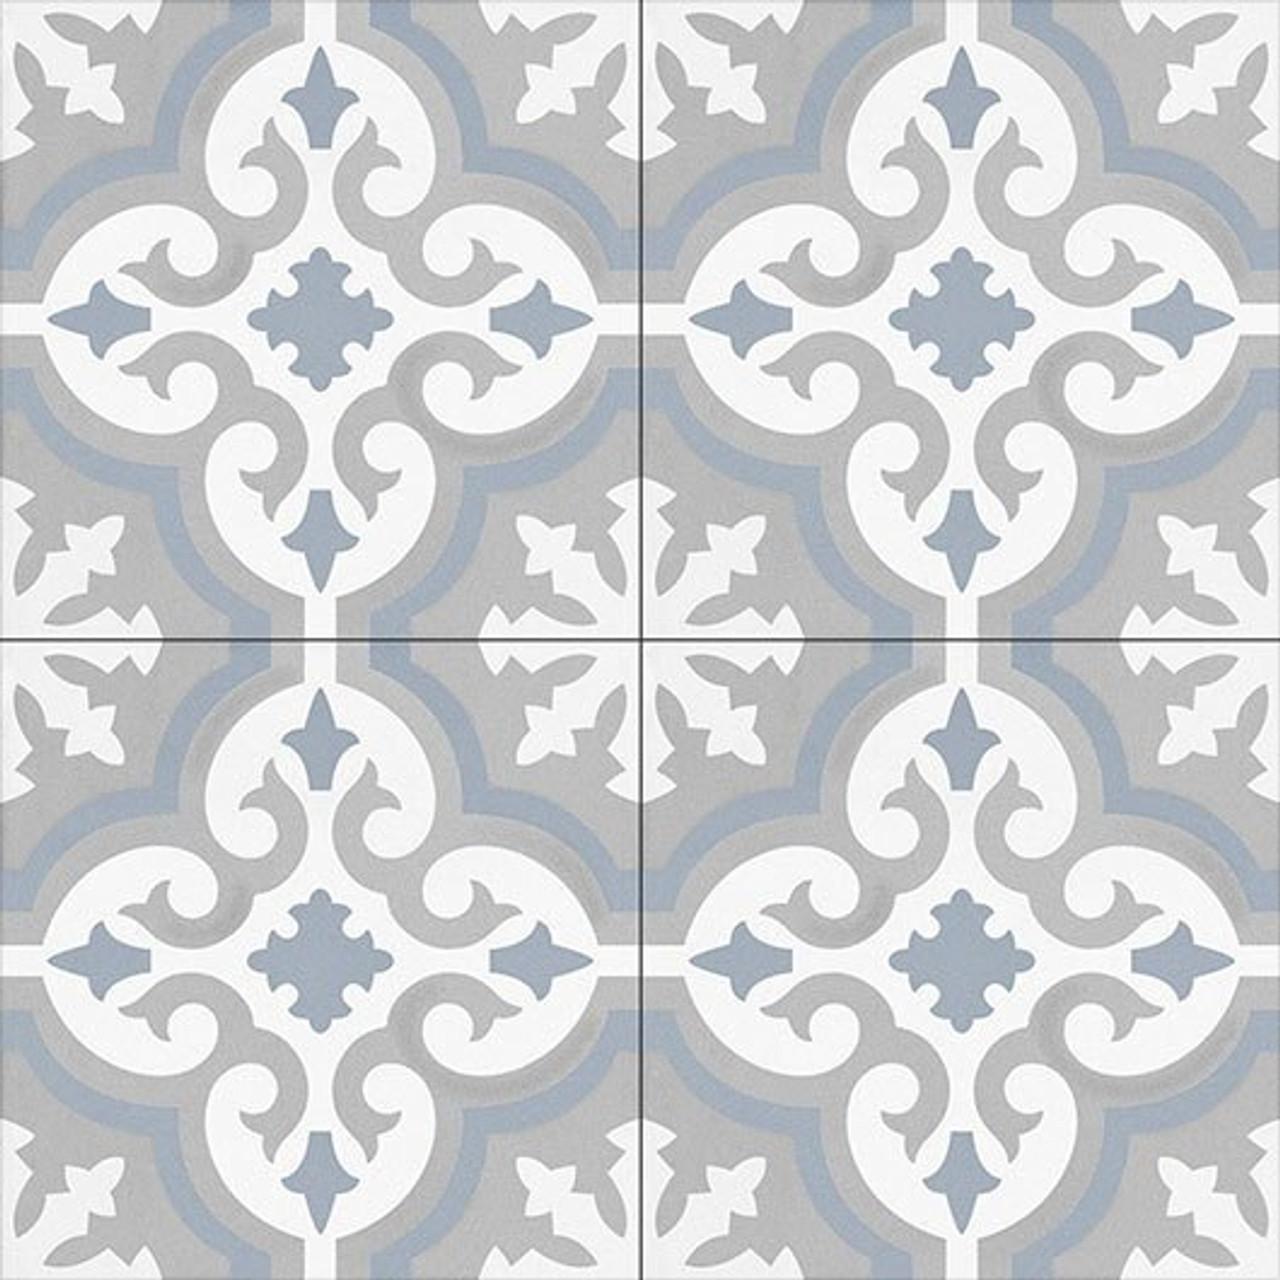 Bella Glass Tiles Amalfi Coast Porcelain Tile Positano Cottage